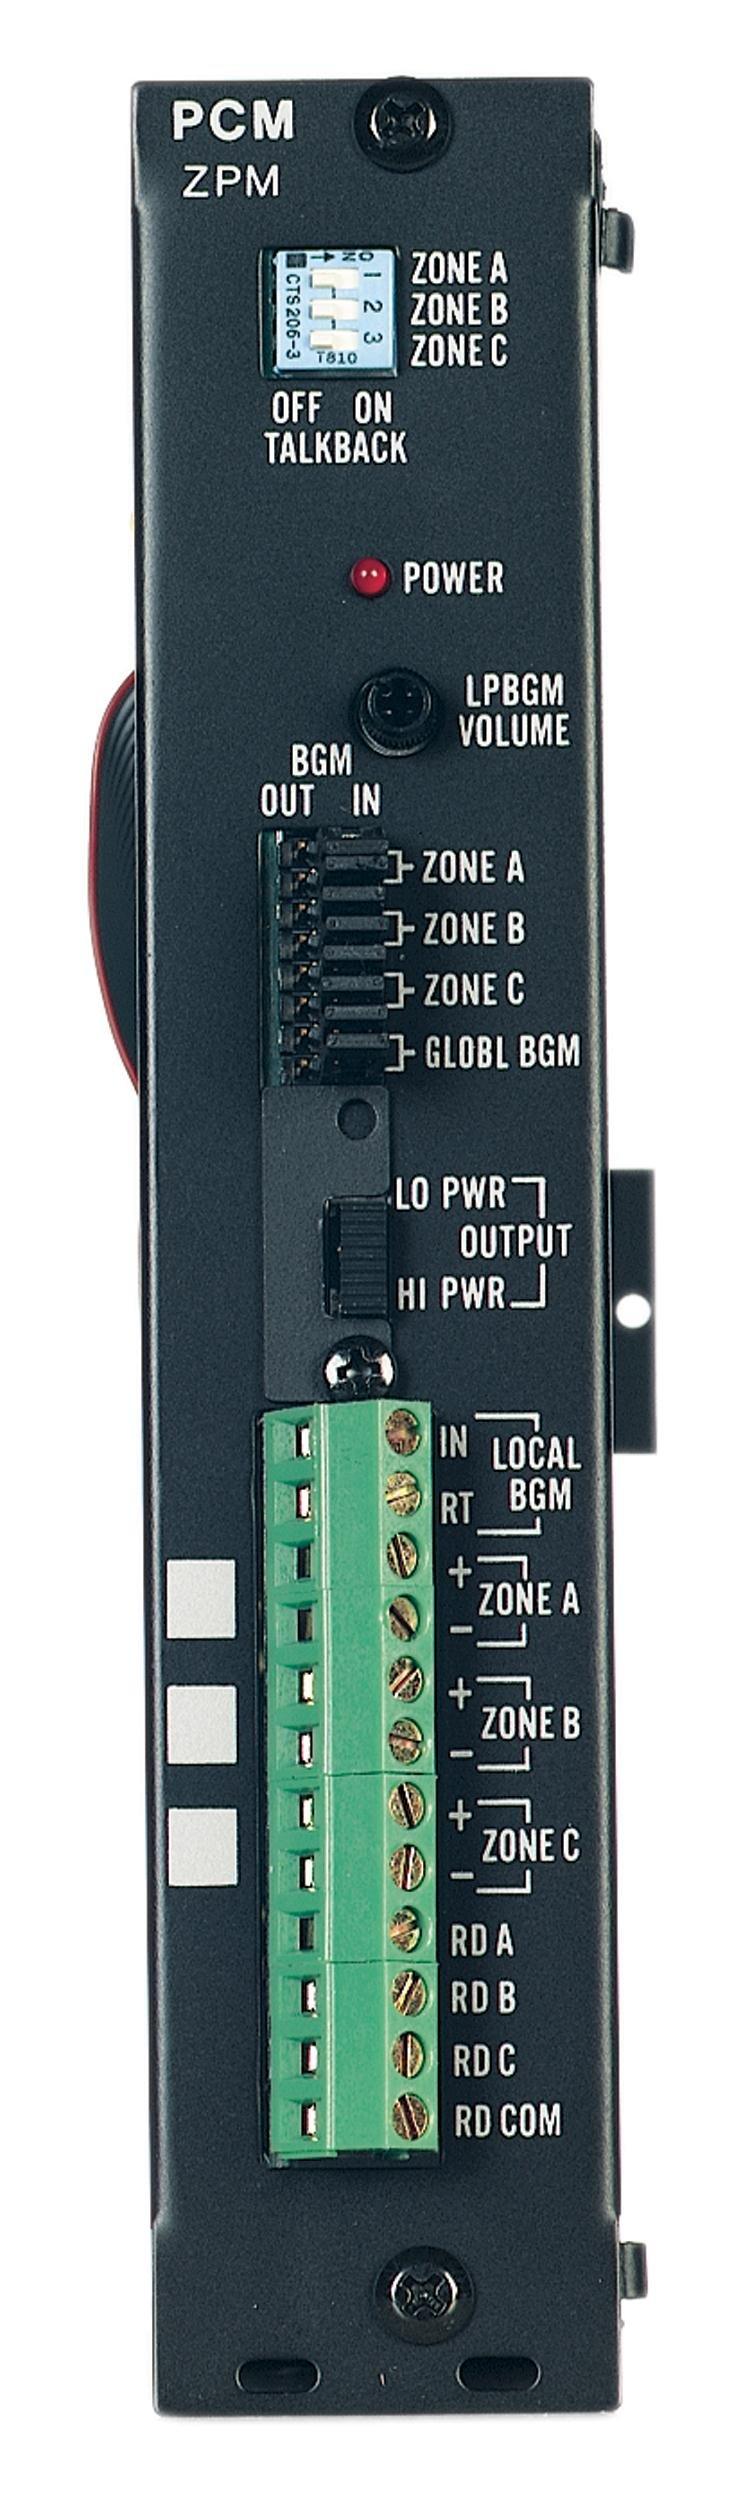 Zone Paging Module for PCM2000-Bogen-Installation Equipment-Bogen Accessories